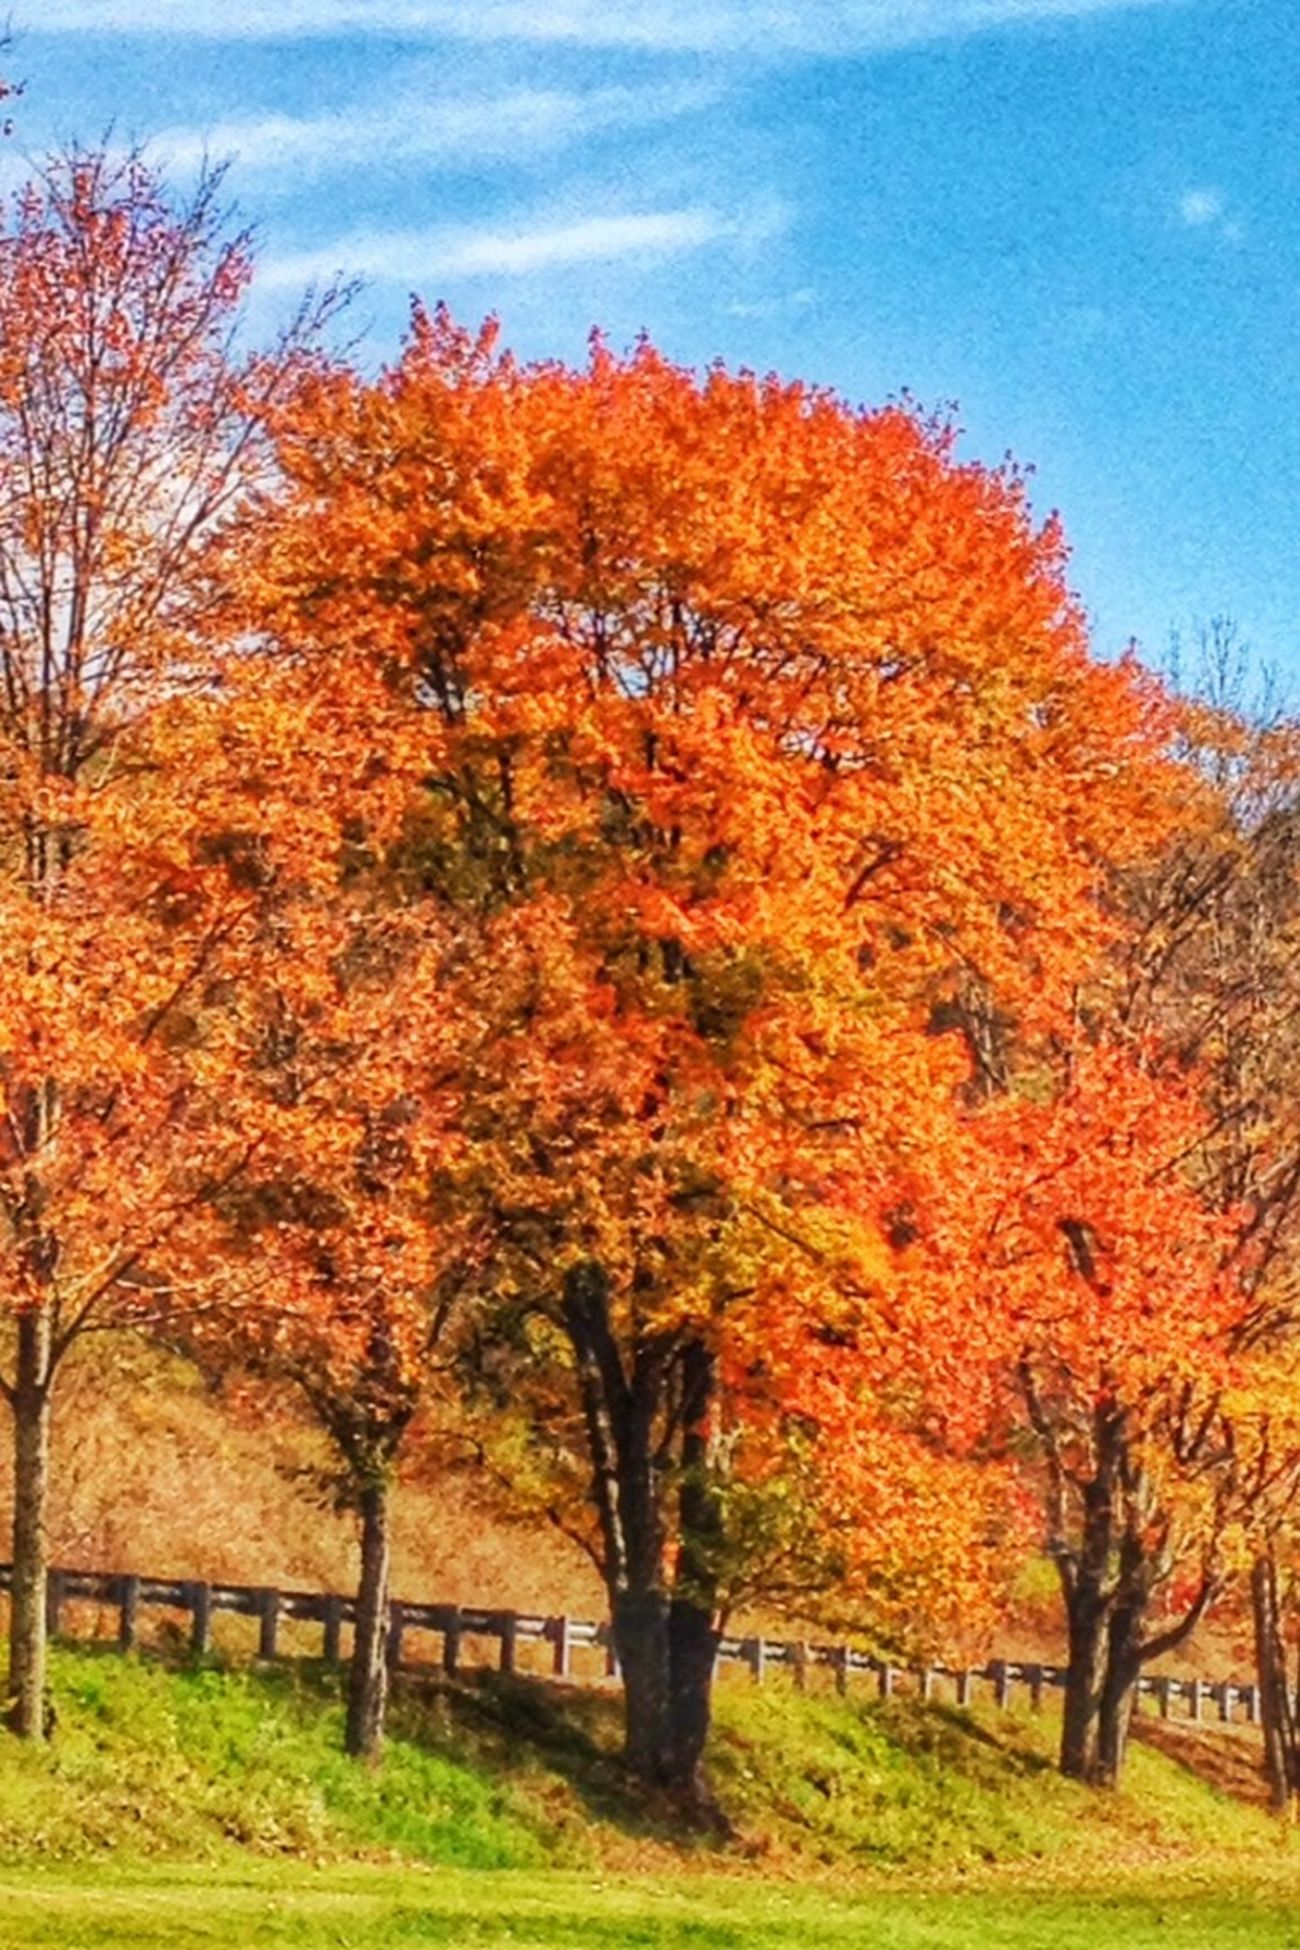 Treegasmic Tuesday TreeGasmicTuesday EE_Daily: Orange Tuesday Beautiful Autumn